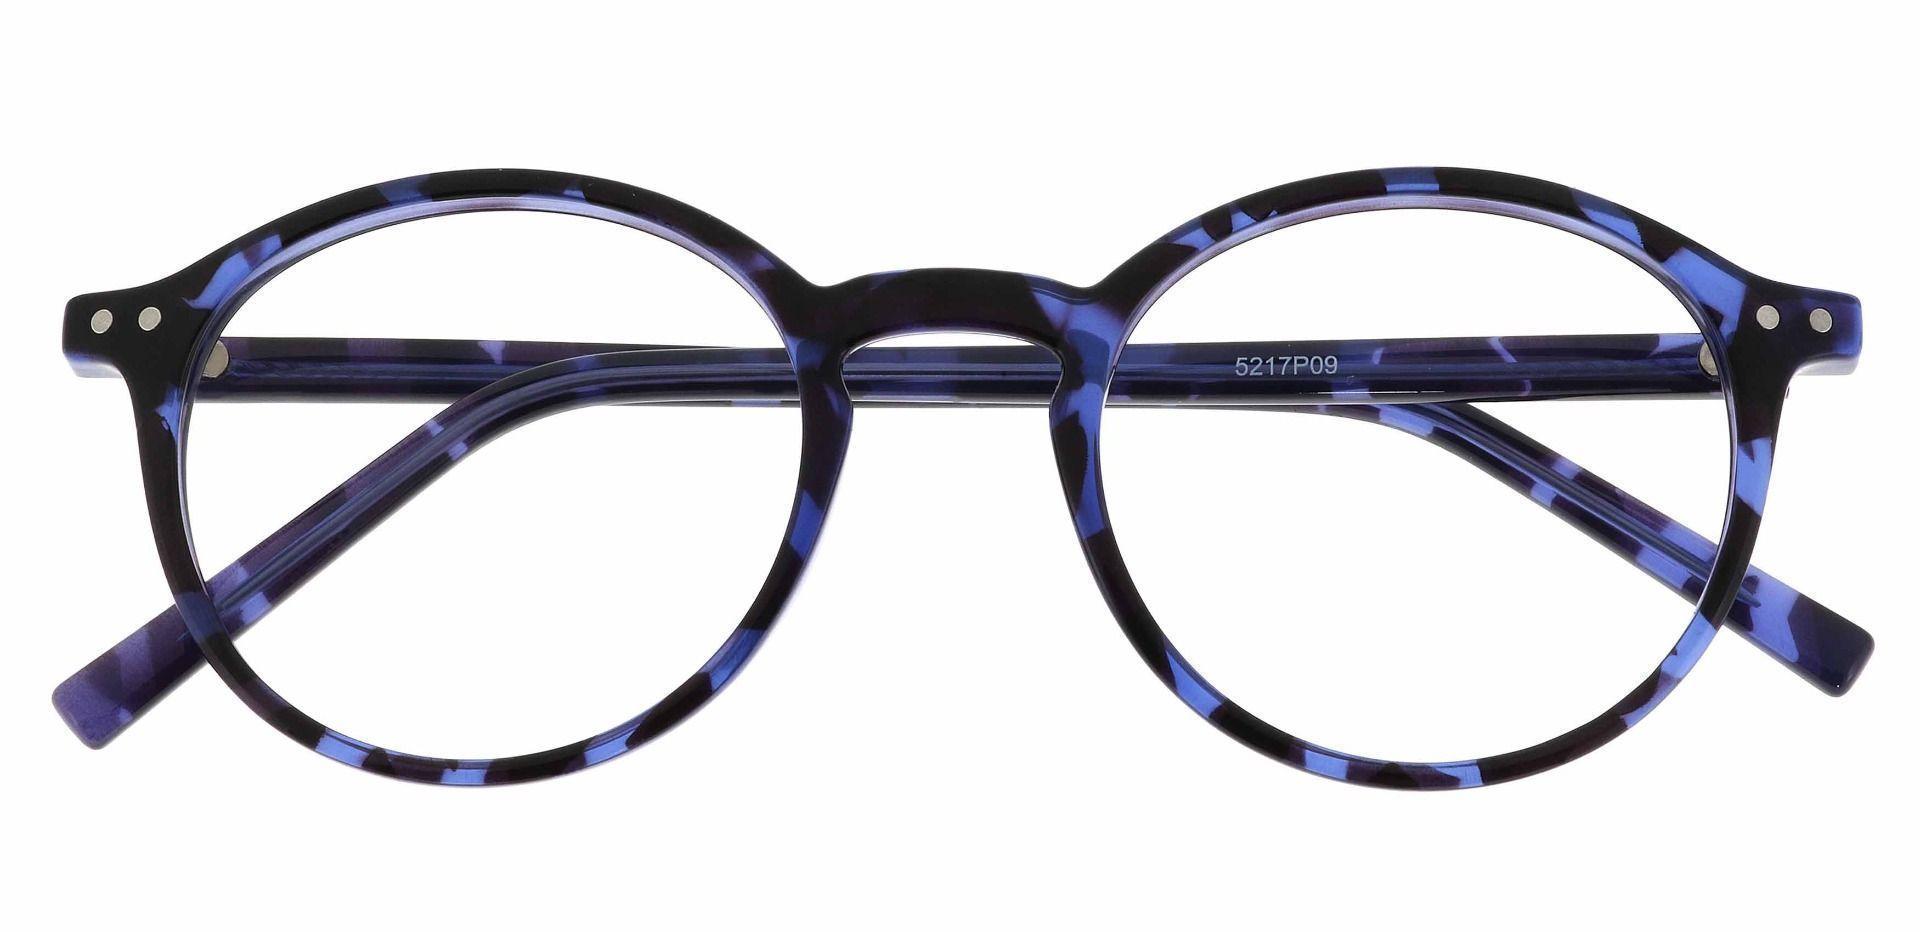 Harvard Round Reading Glasses - Blue